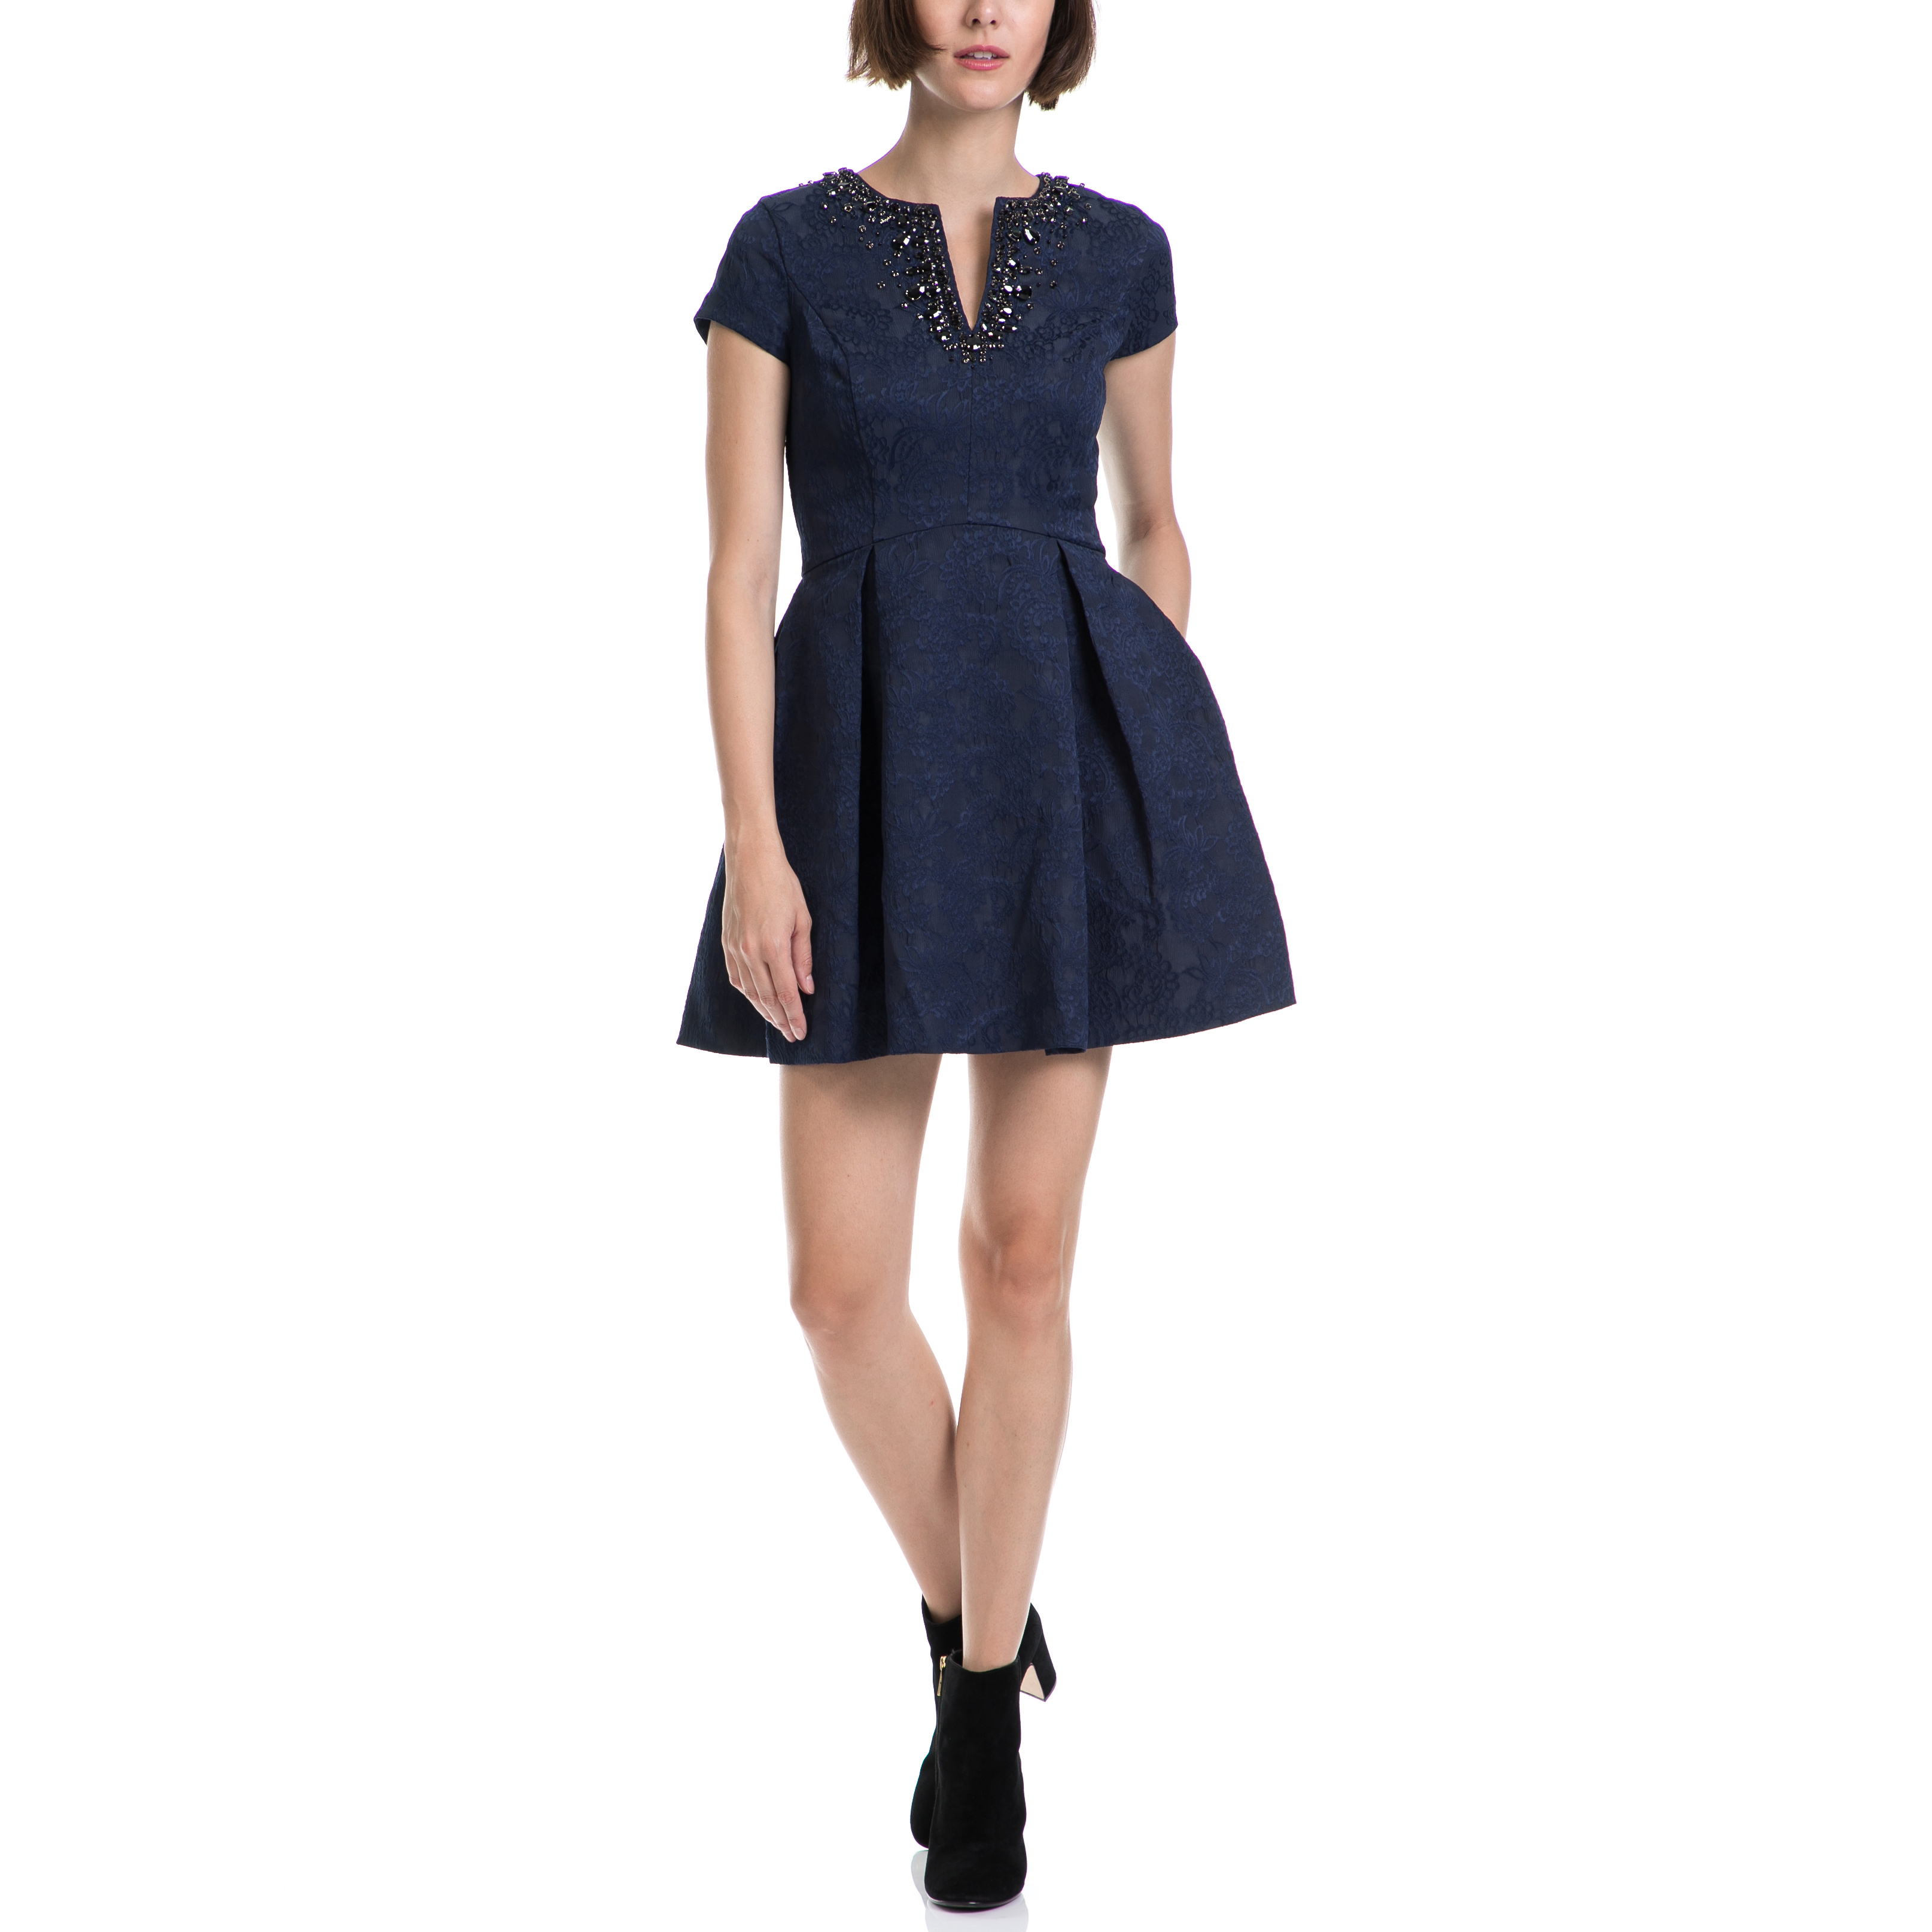 JUICY COUTURE – Γυναικείο φόρεμα JUICY COUTURE μπλε